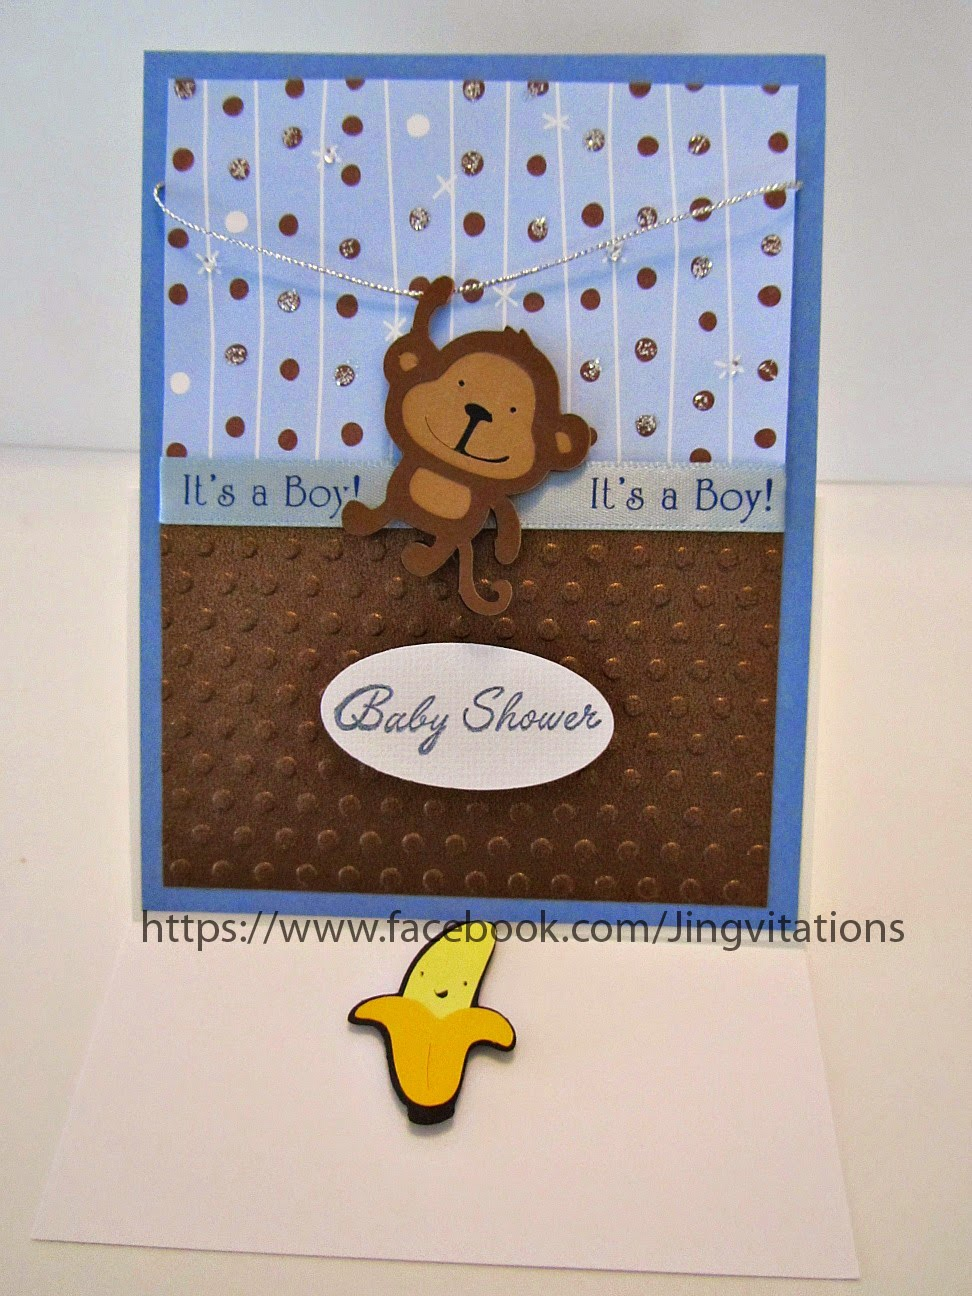 Jingvitations: Monkey Theme for Baby Shower Invitations